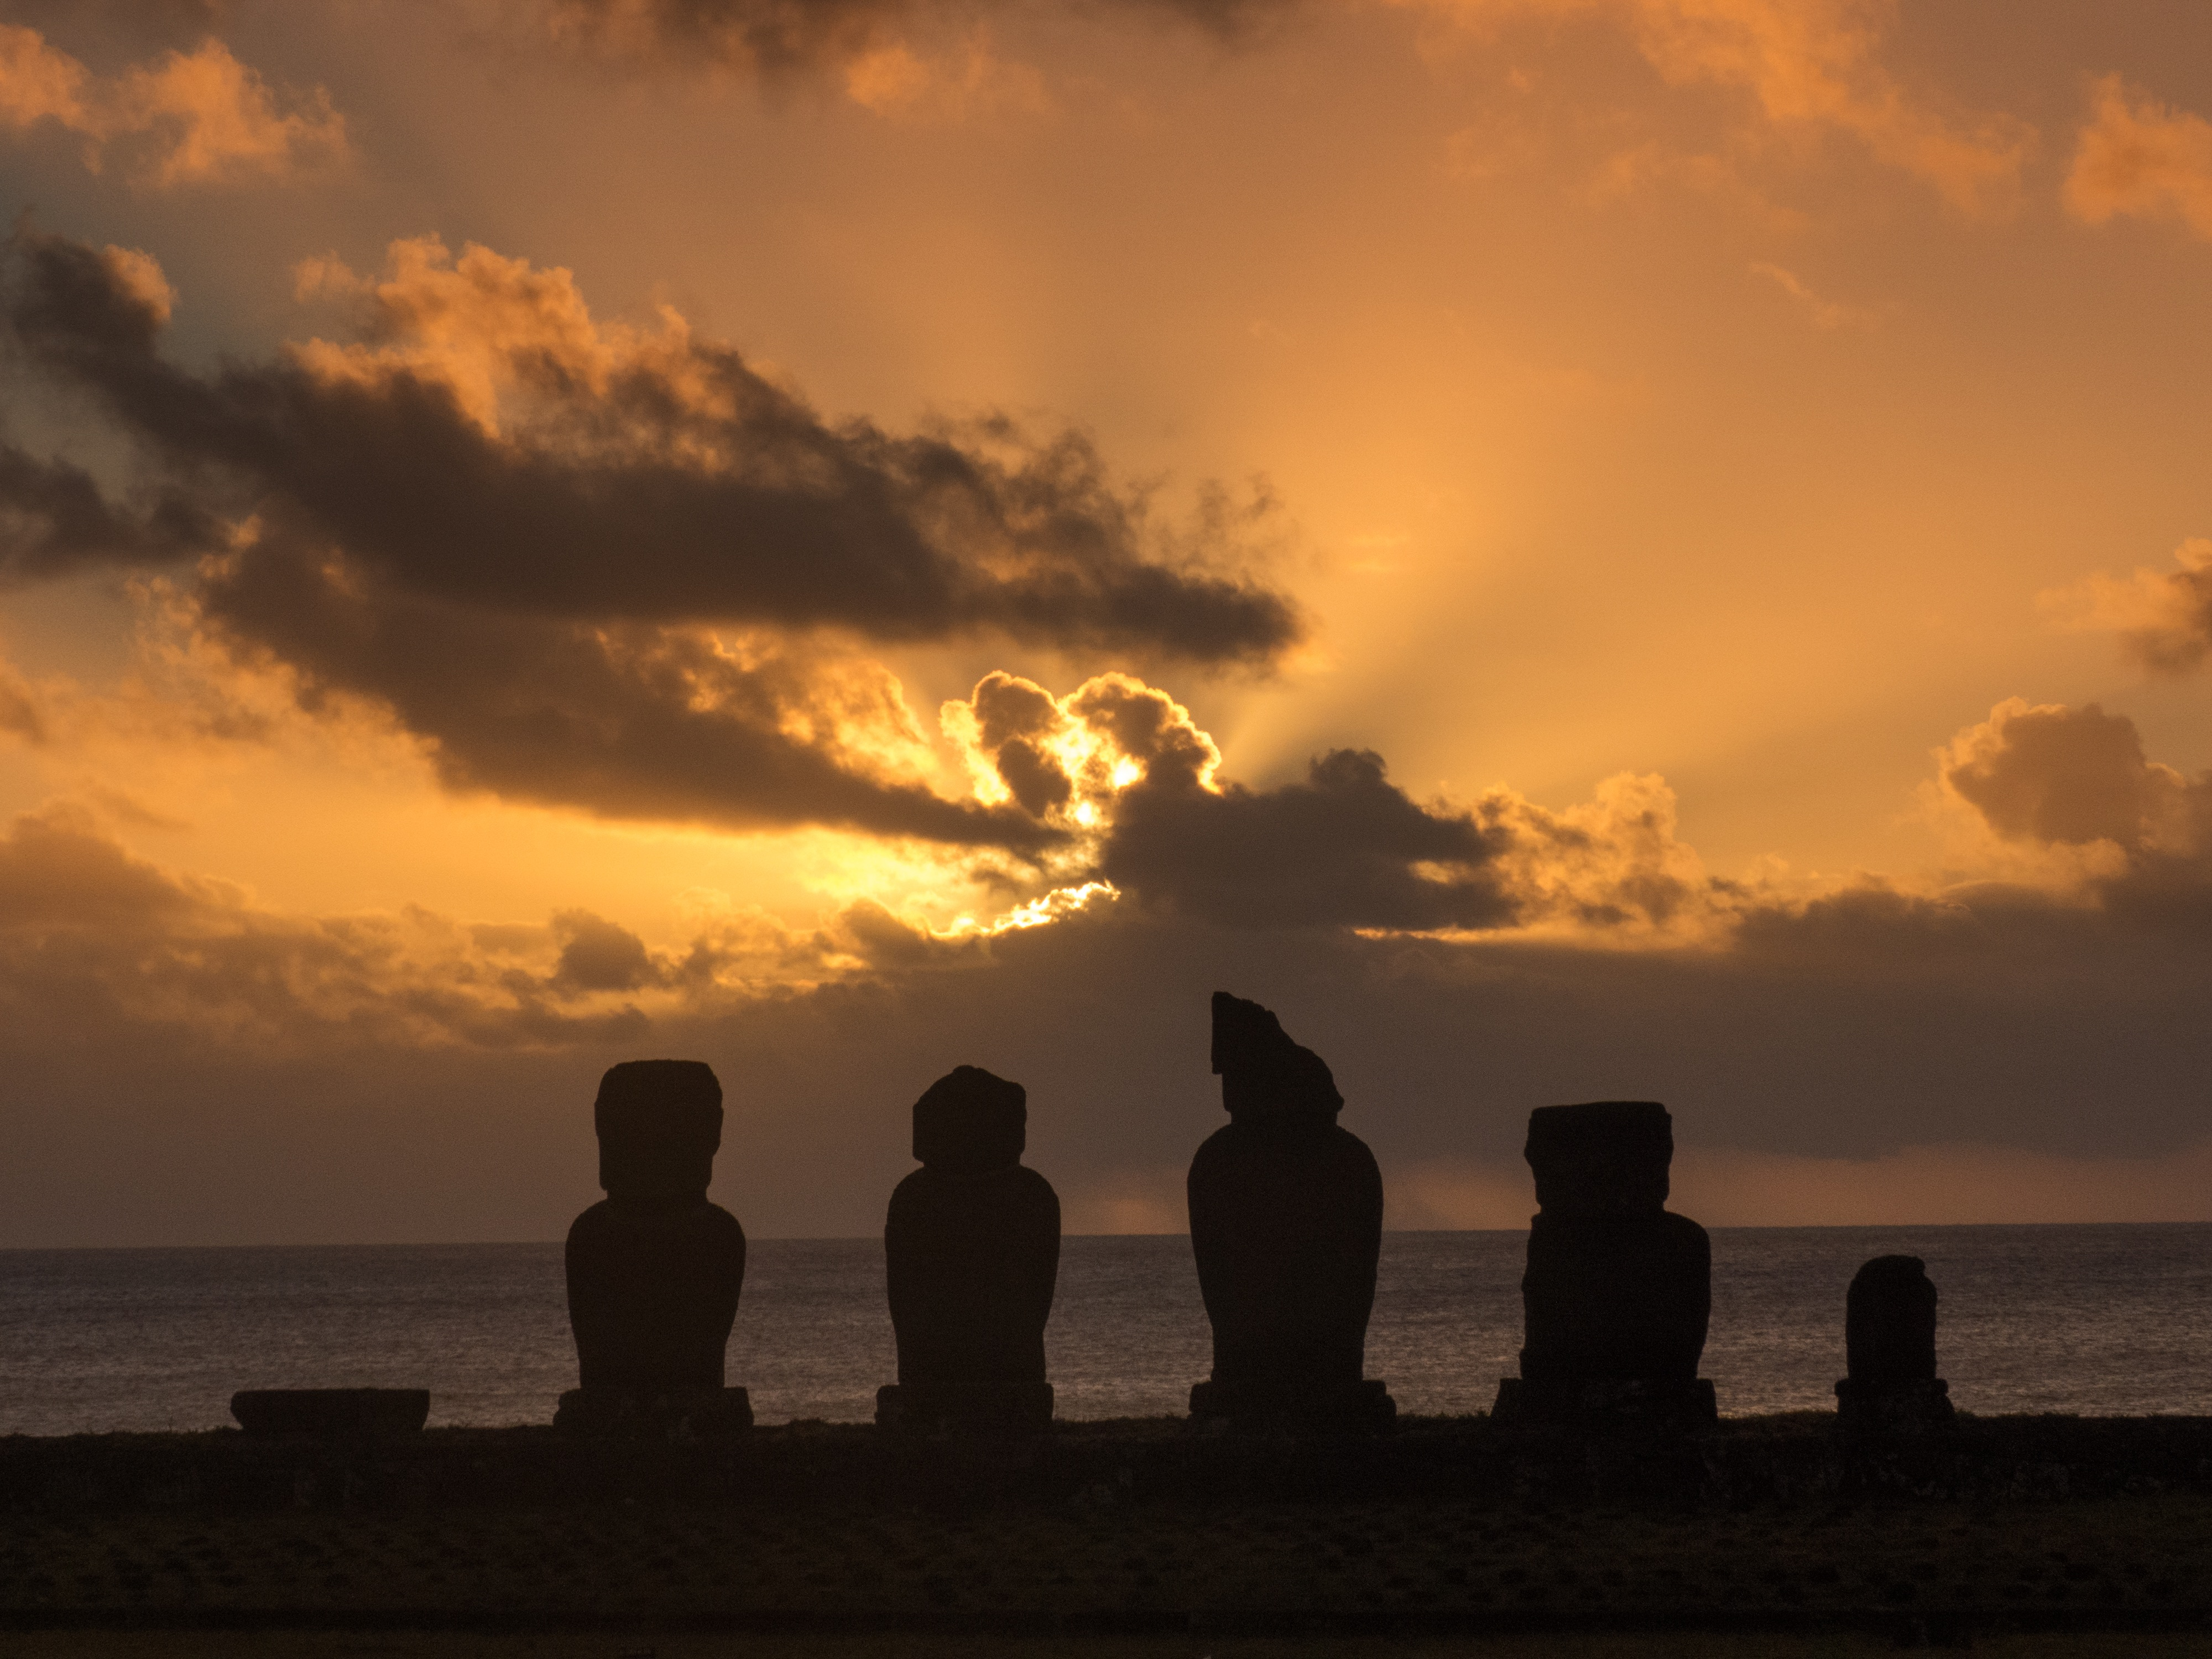 Ahu Tahai - Île de Pâques